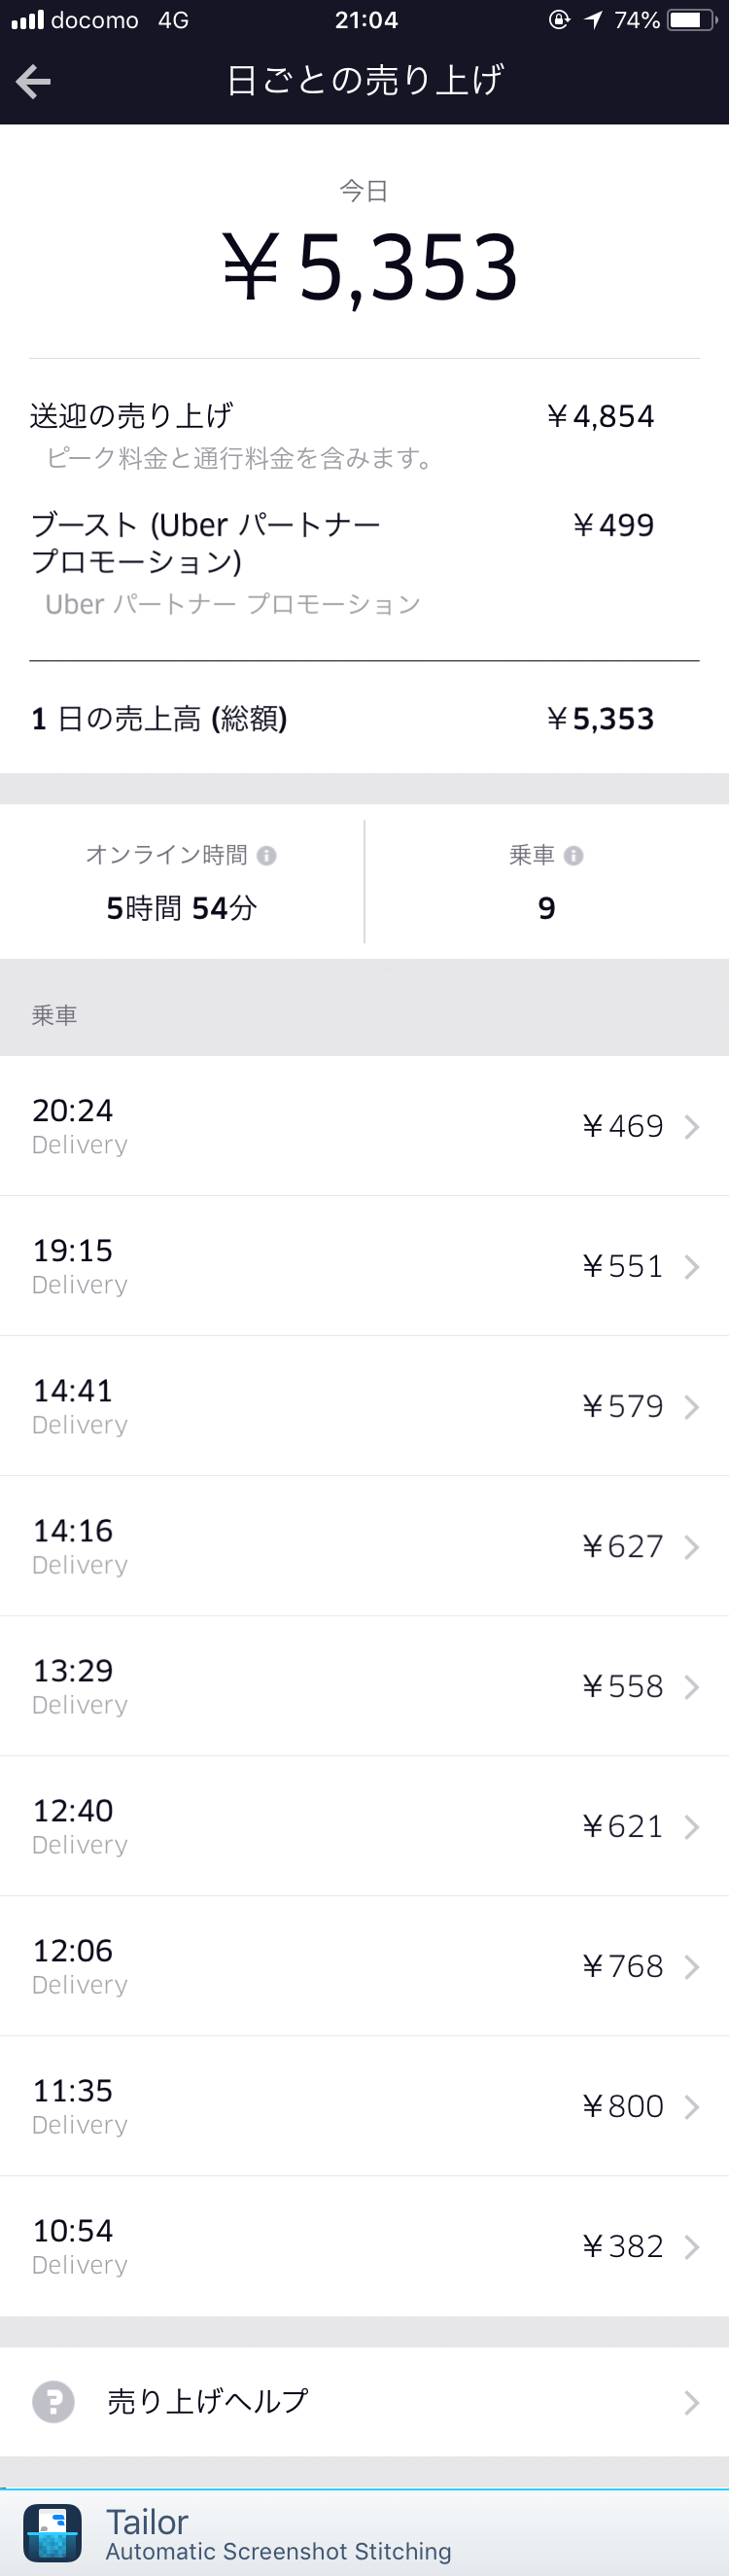 【Uber Eats配達】4月17日の売上数字